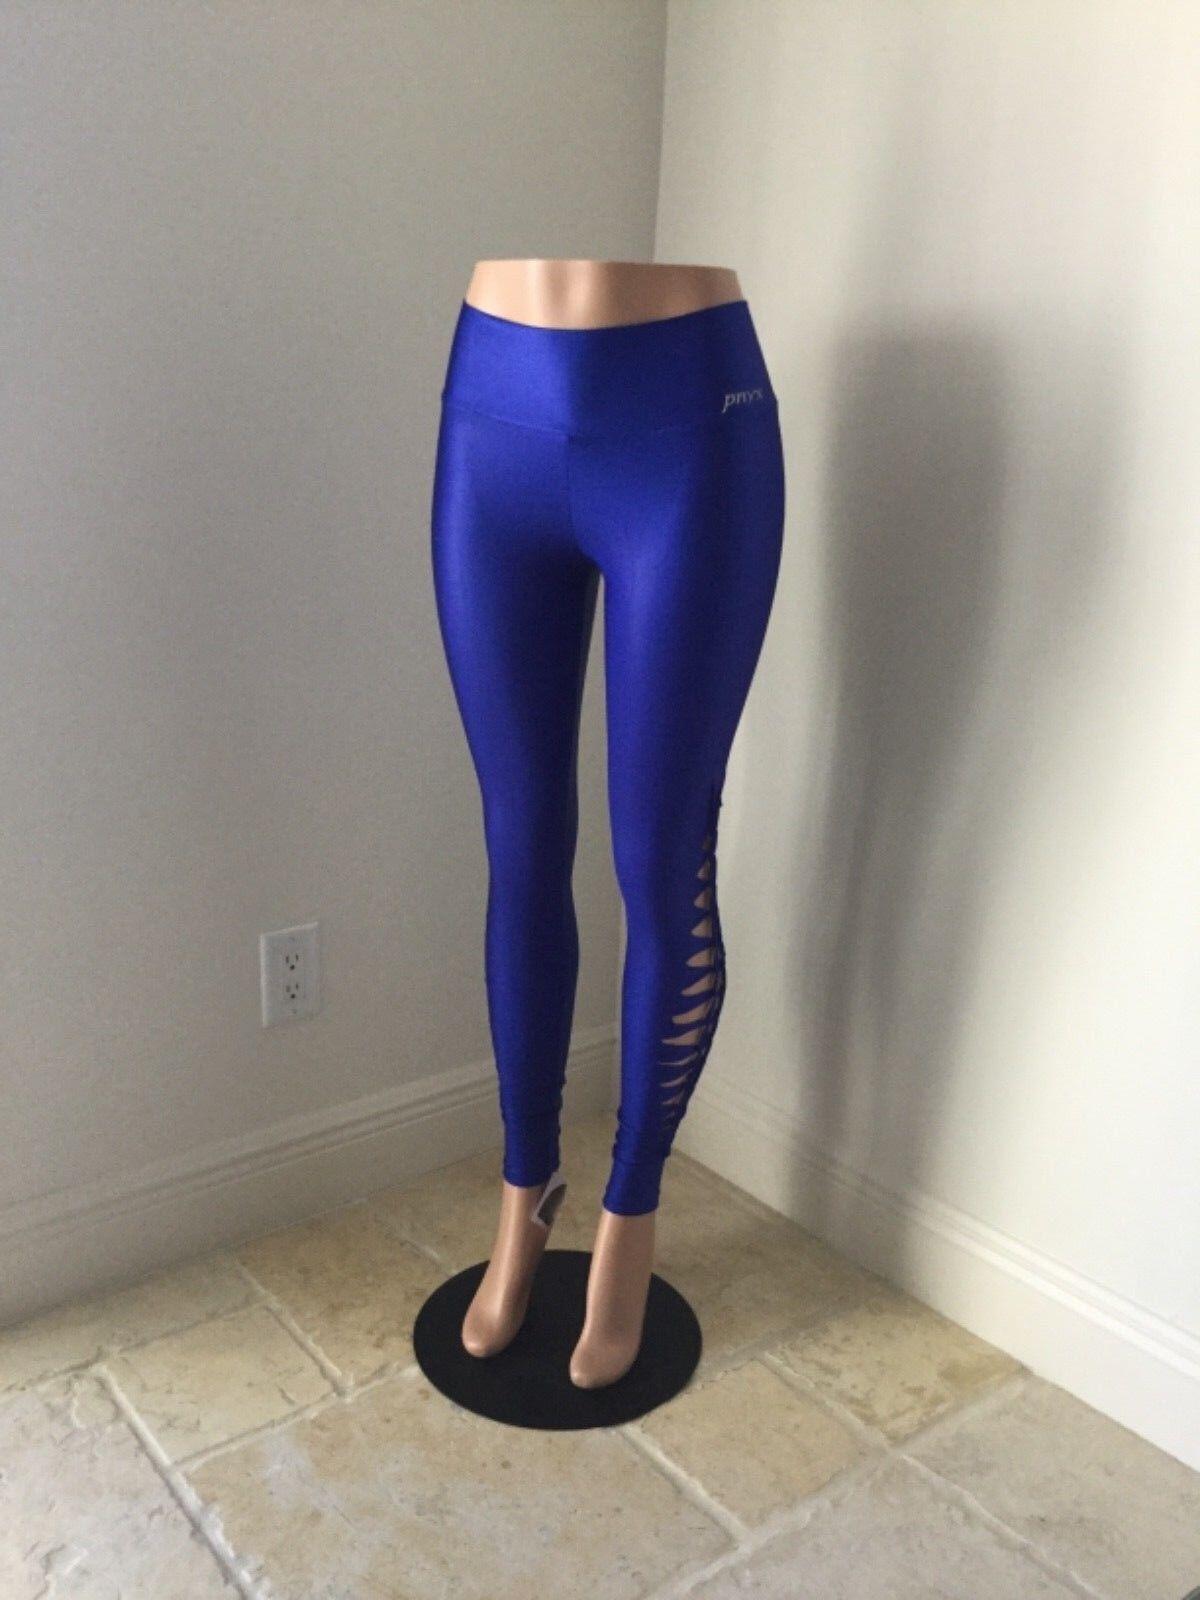 Bia fitness active wear colombian women's Brazil S gym yoga pants leggings P blue